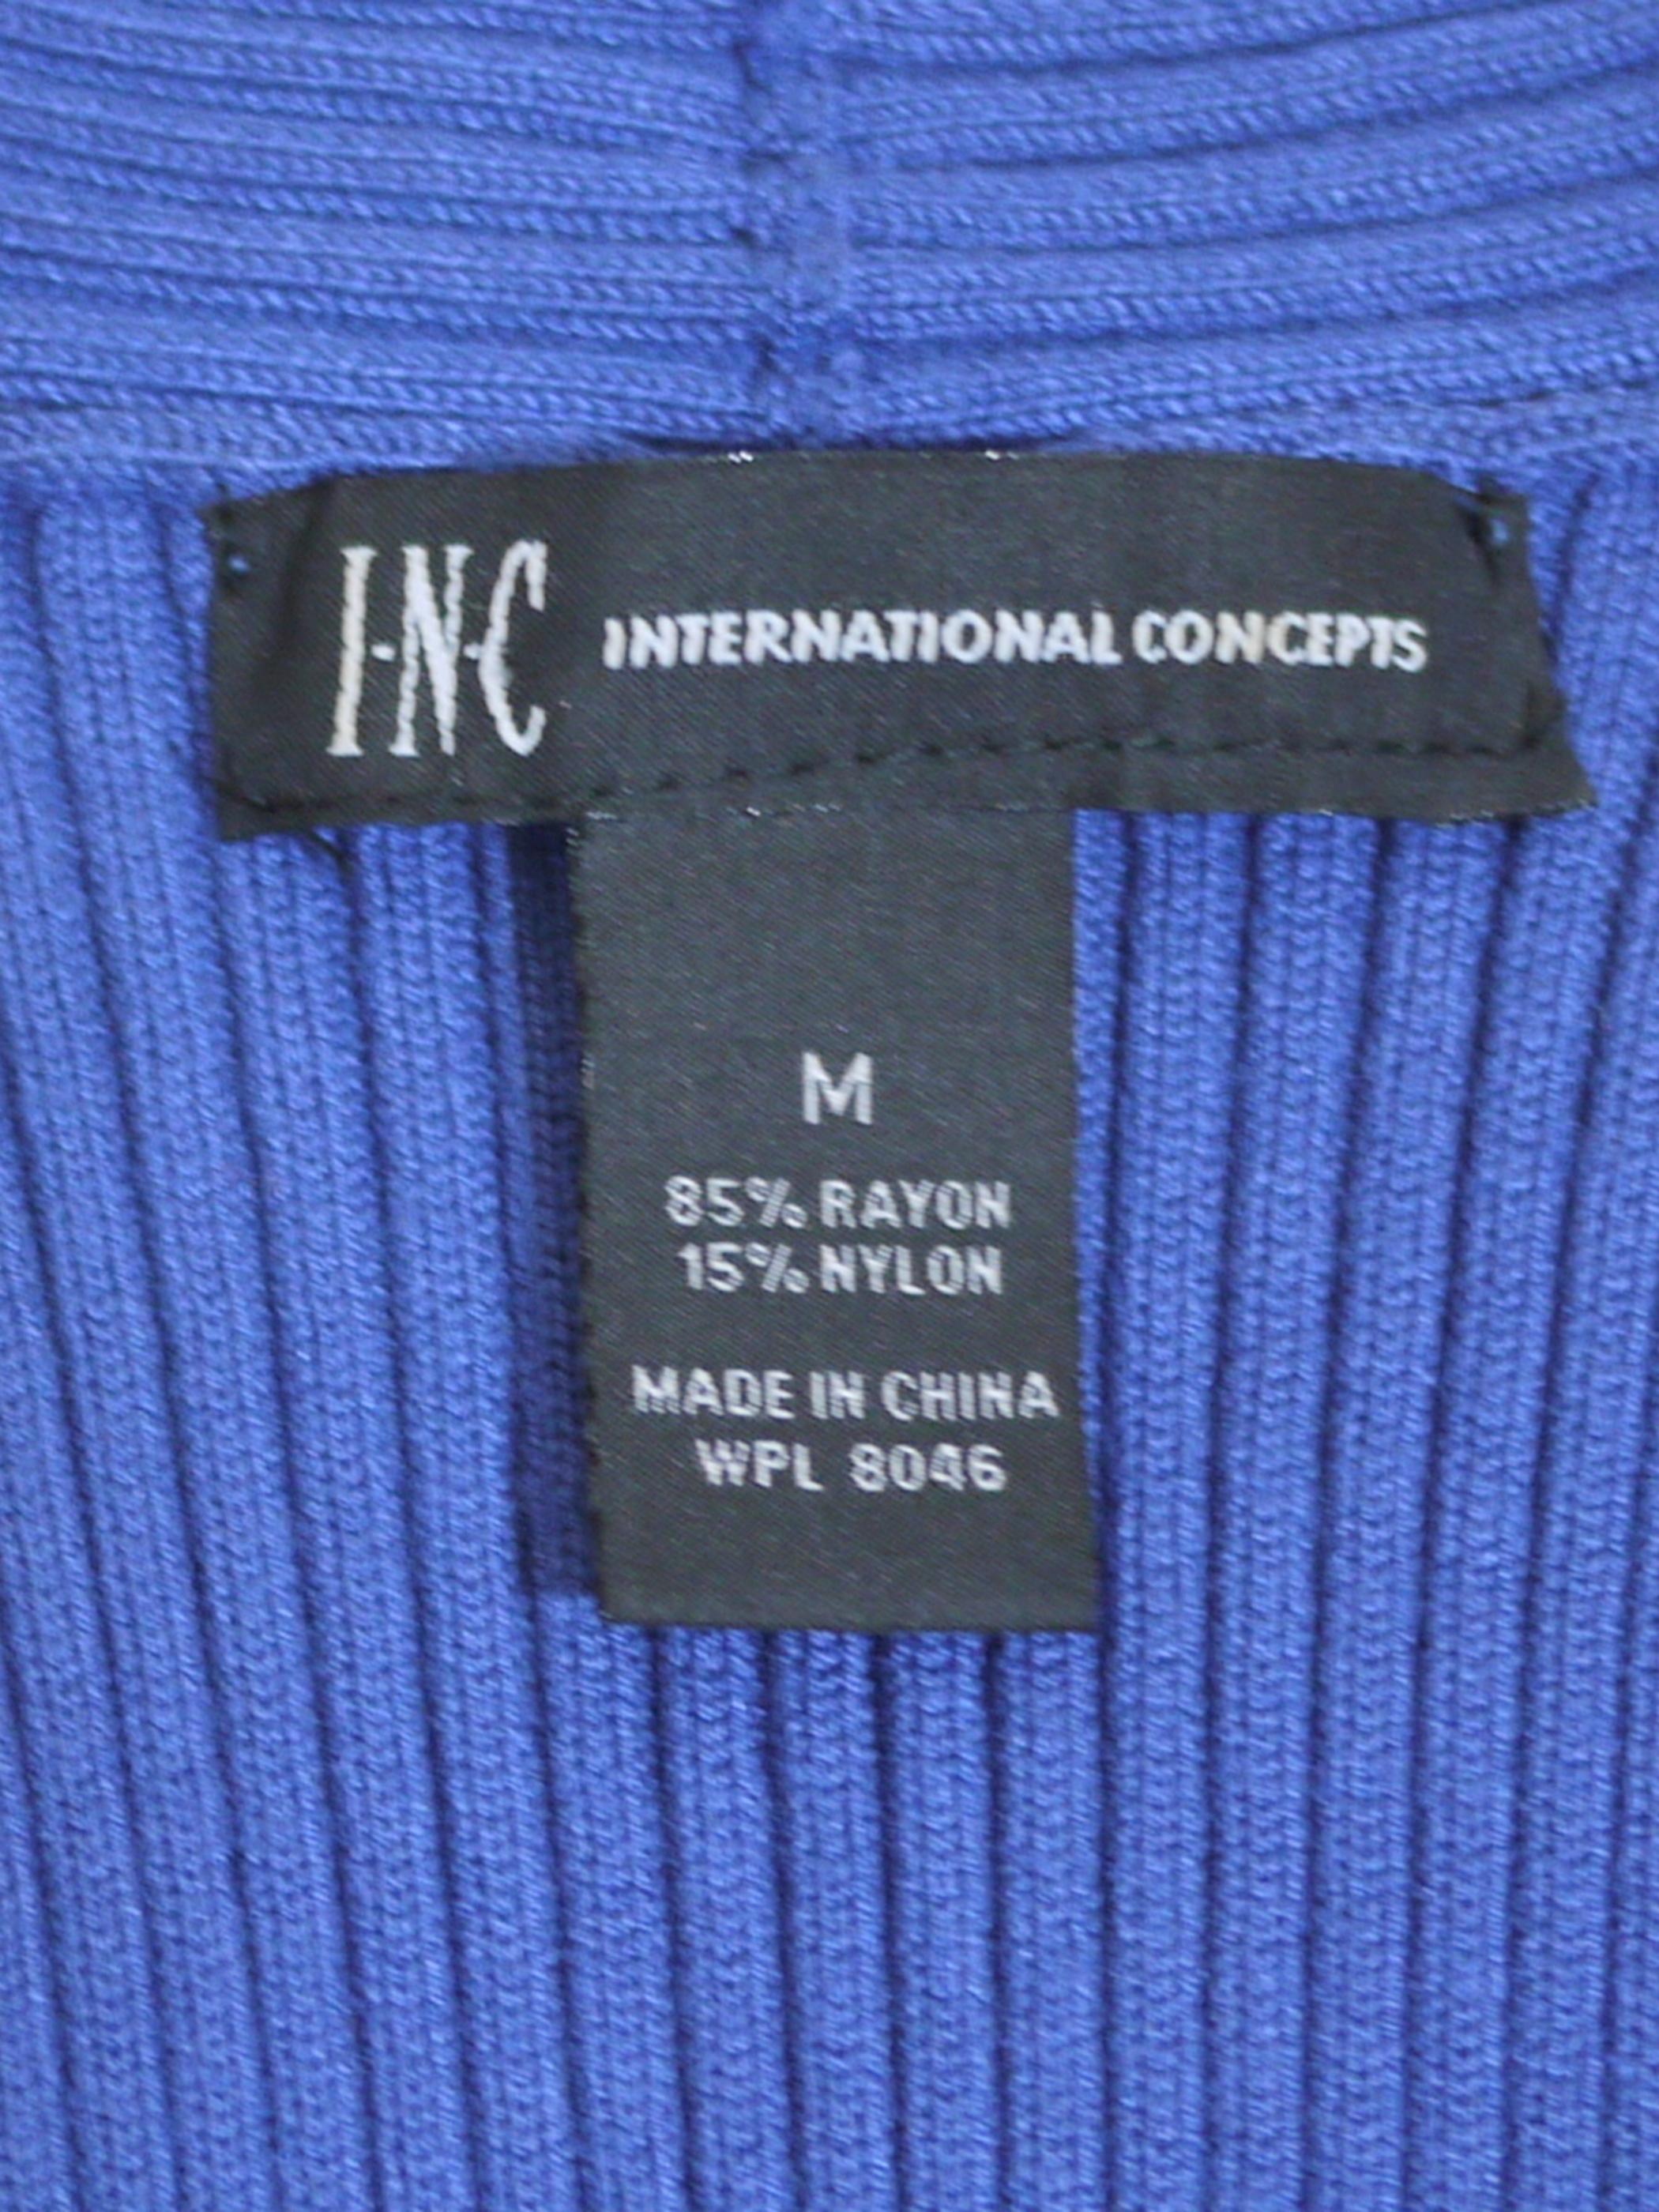 INTERNATIONAL CONCEPTS Sleeveless Tops SizeM